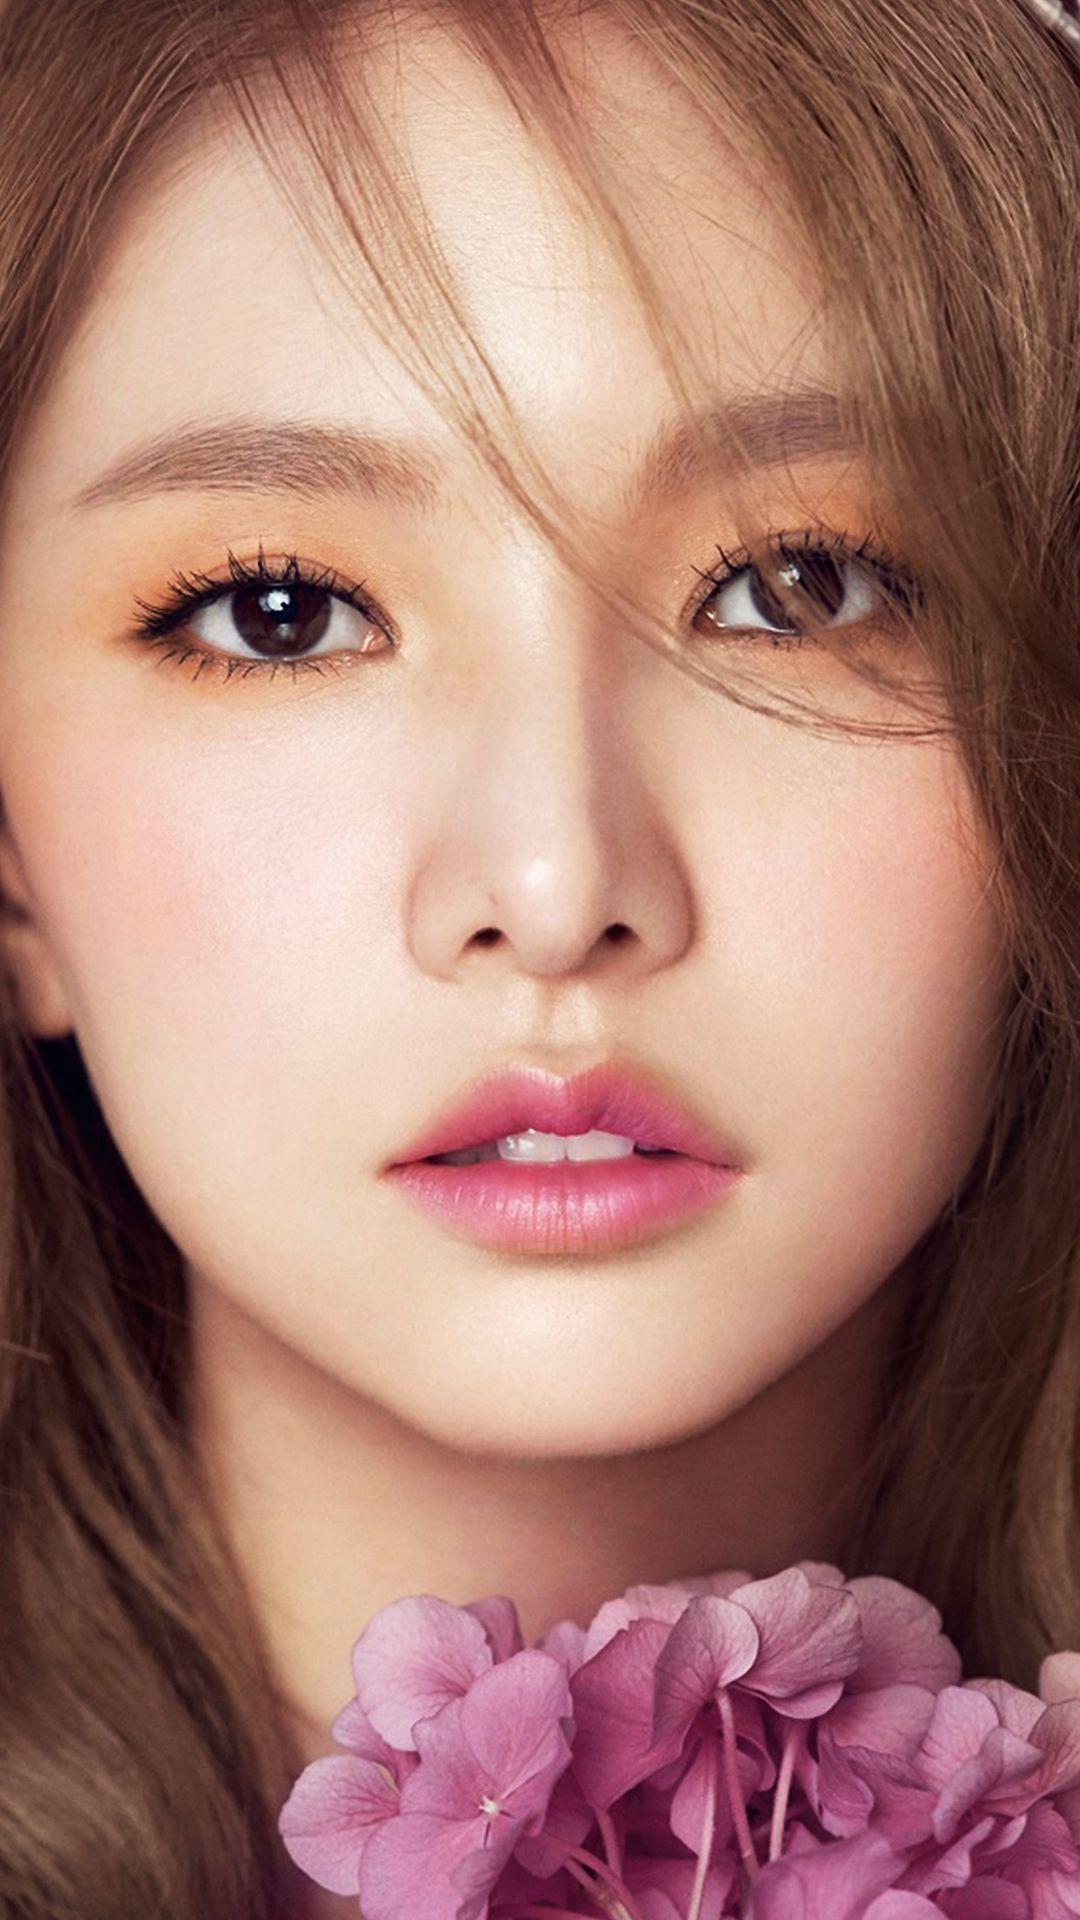 Kpop Girl Flower Cute Pink Red iPhone 8 Wallpapers